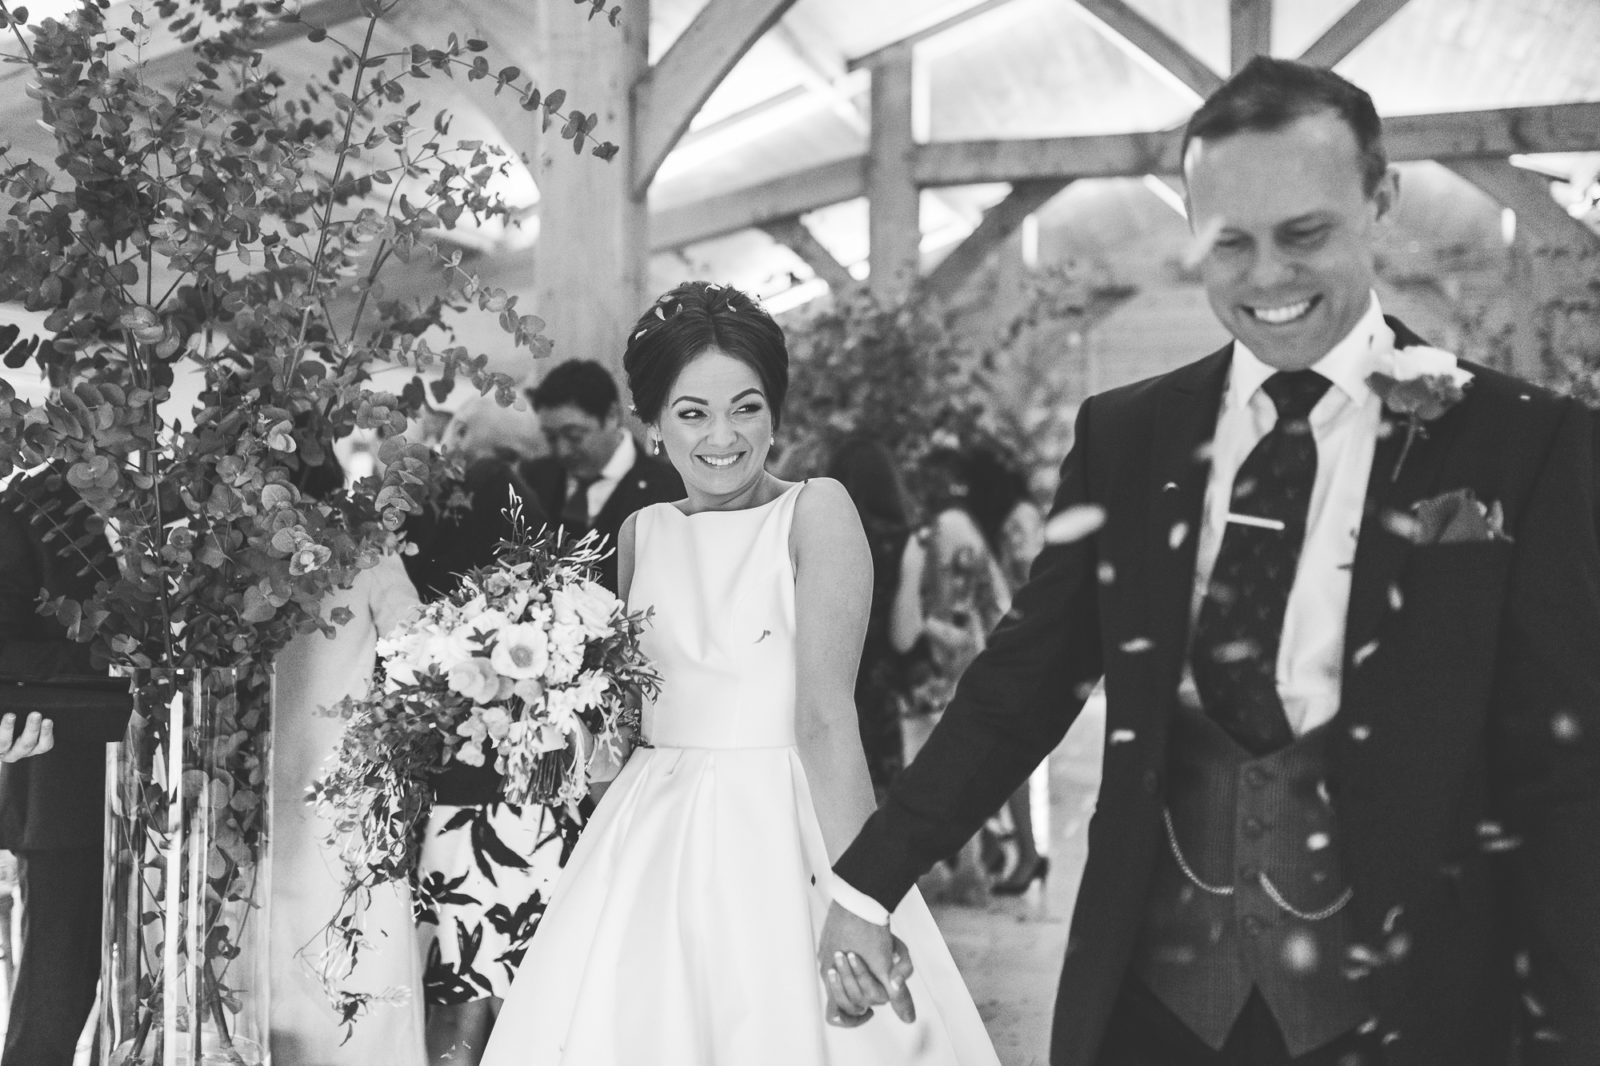 weddings.tom biddle